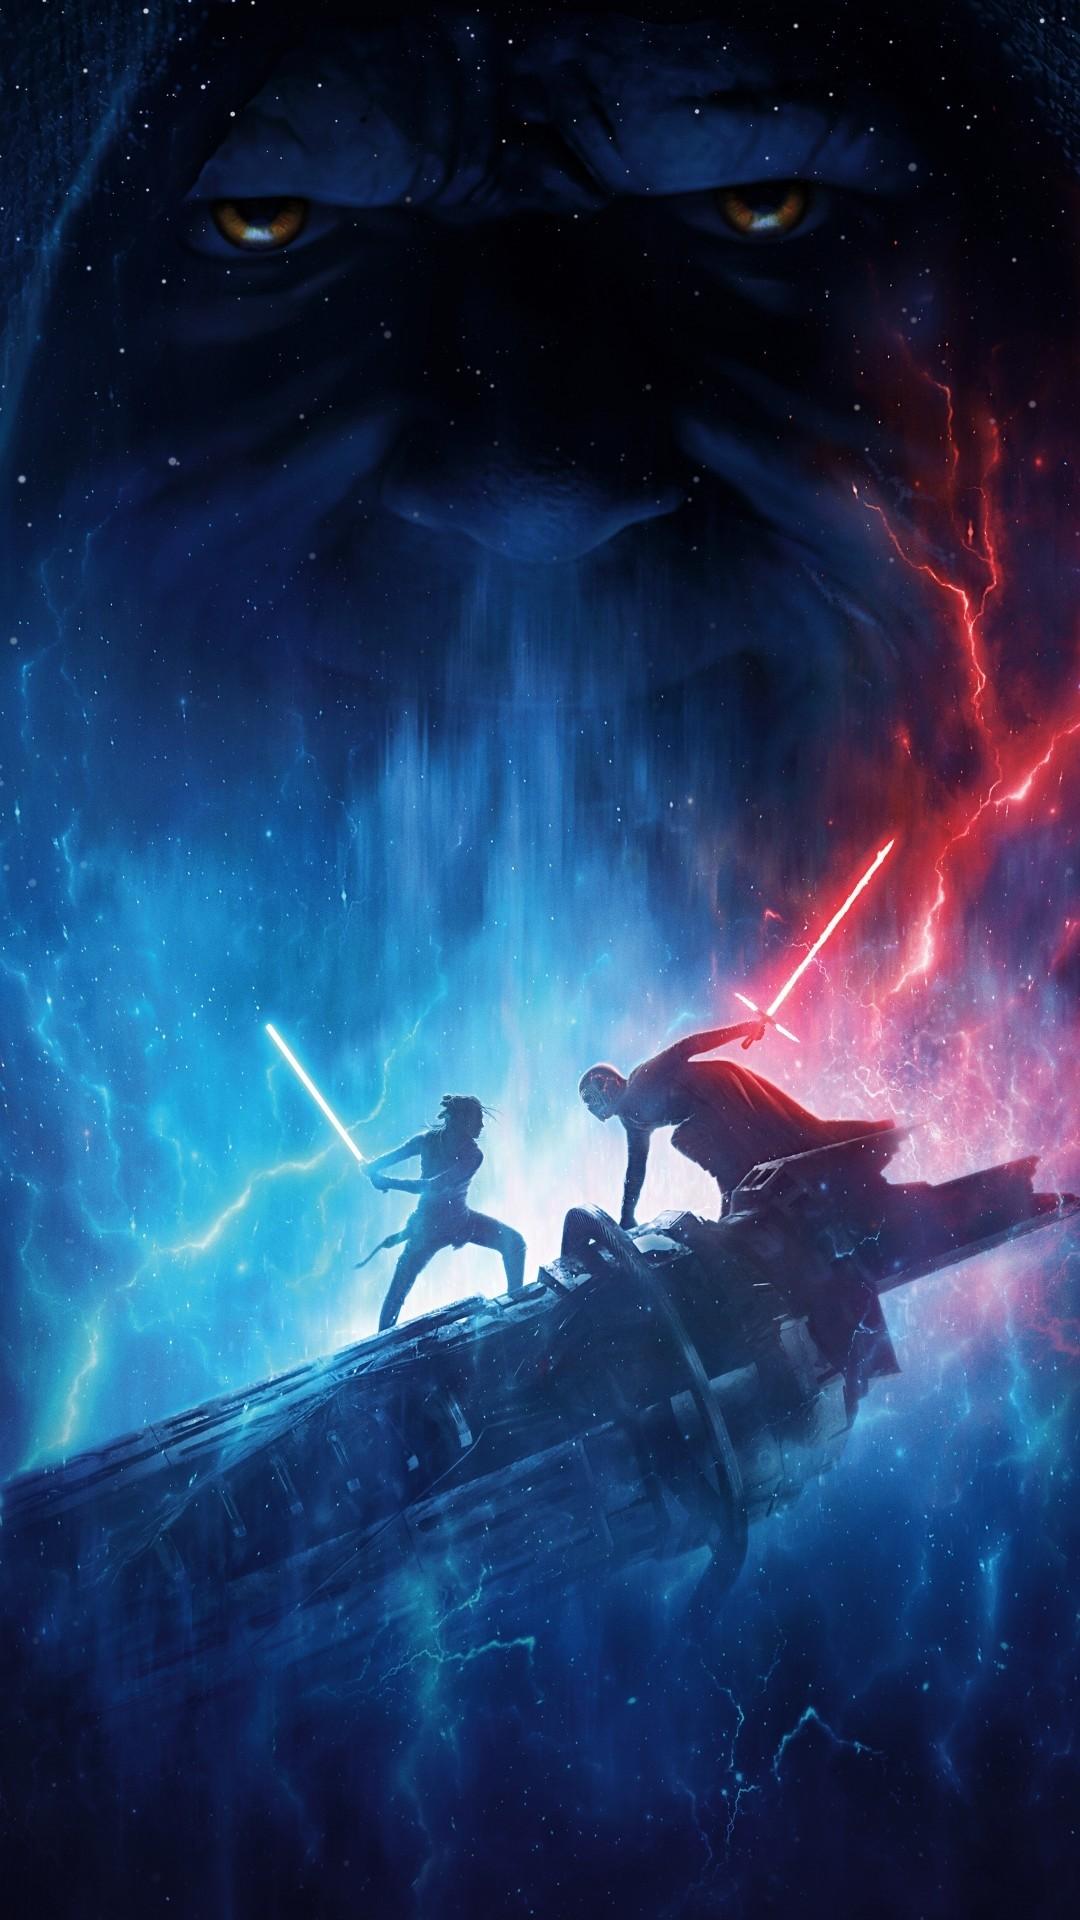 Star Wars The Rise Of Skywalker iphone 8 plus wallpaper